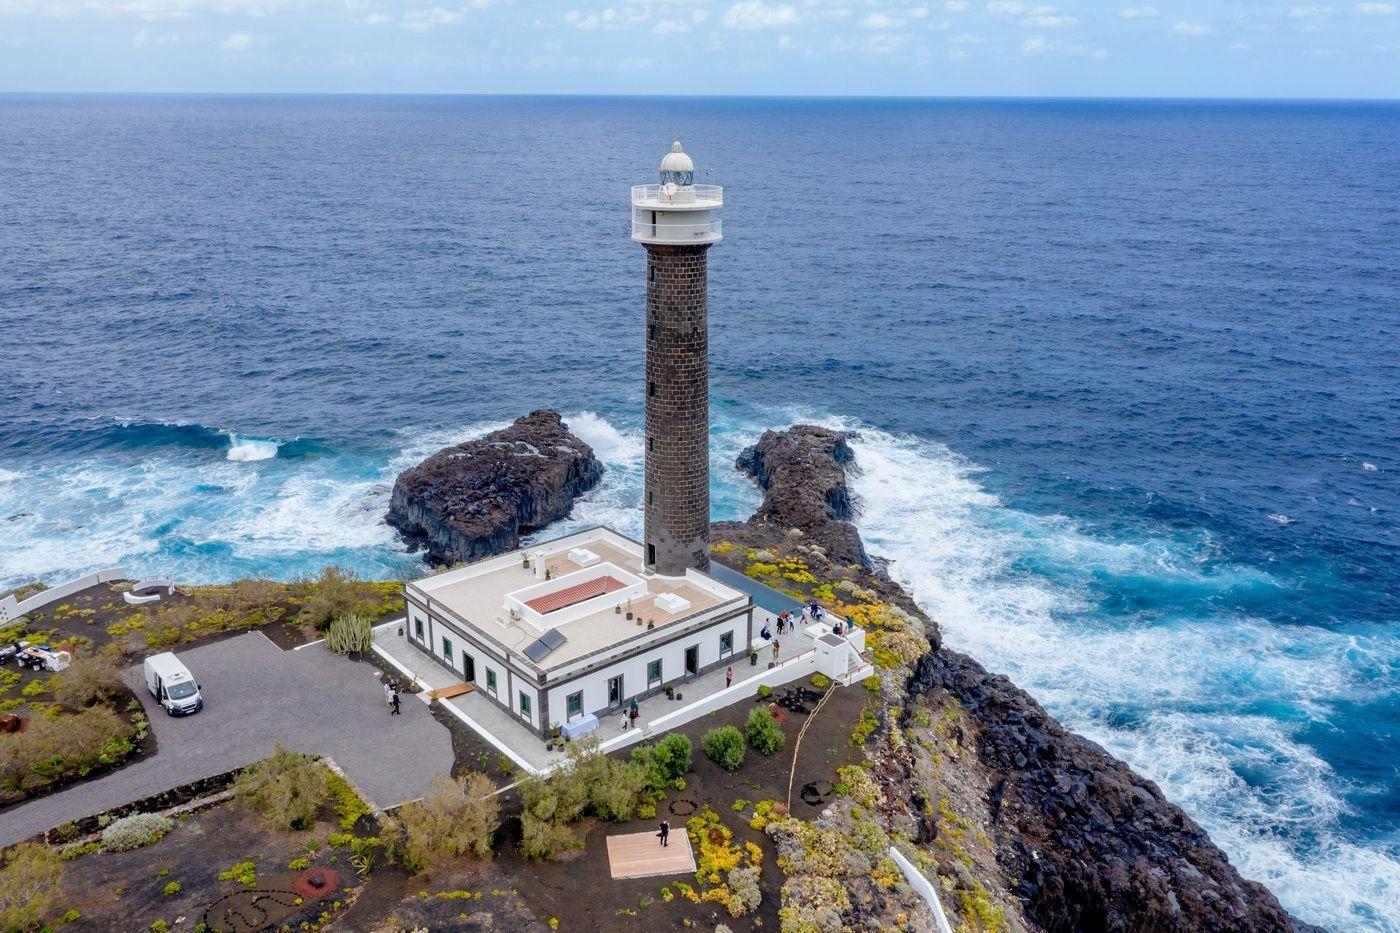 Faro Punta Cumplida маяк Испания